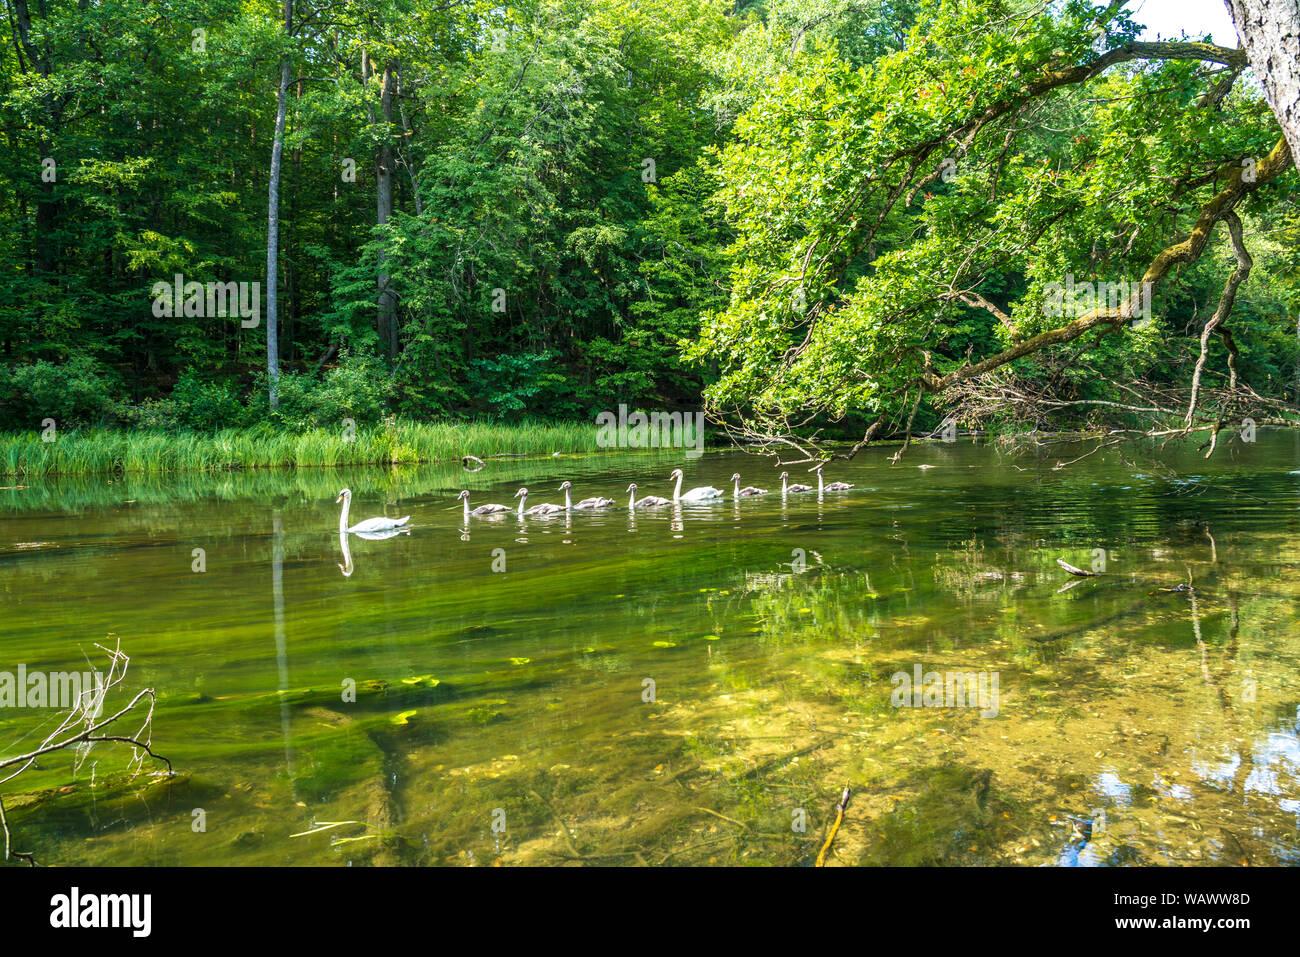 Schwäne auf dem  Fluss Krutynia oder Kruttinna, UNESCO Biosphärenreservat Masurische Seen bei Krutyn, Ermland-Masuren, Polen, Europa   swans on the Kr Stock Photo